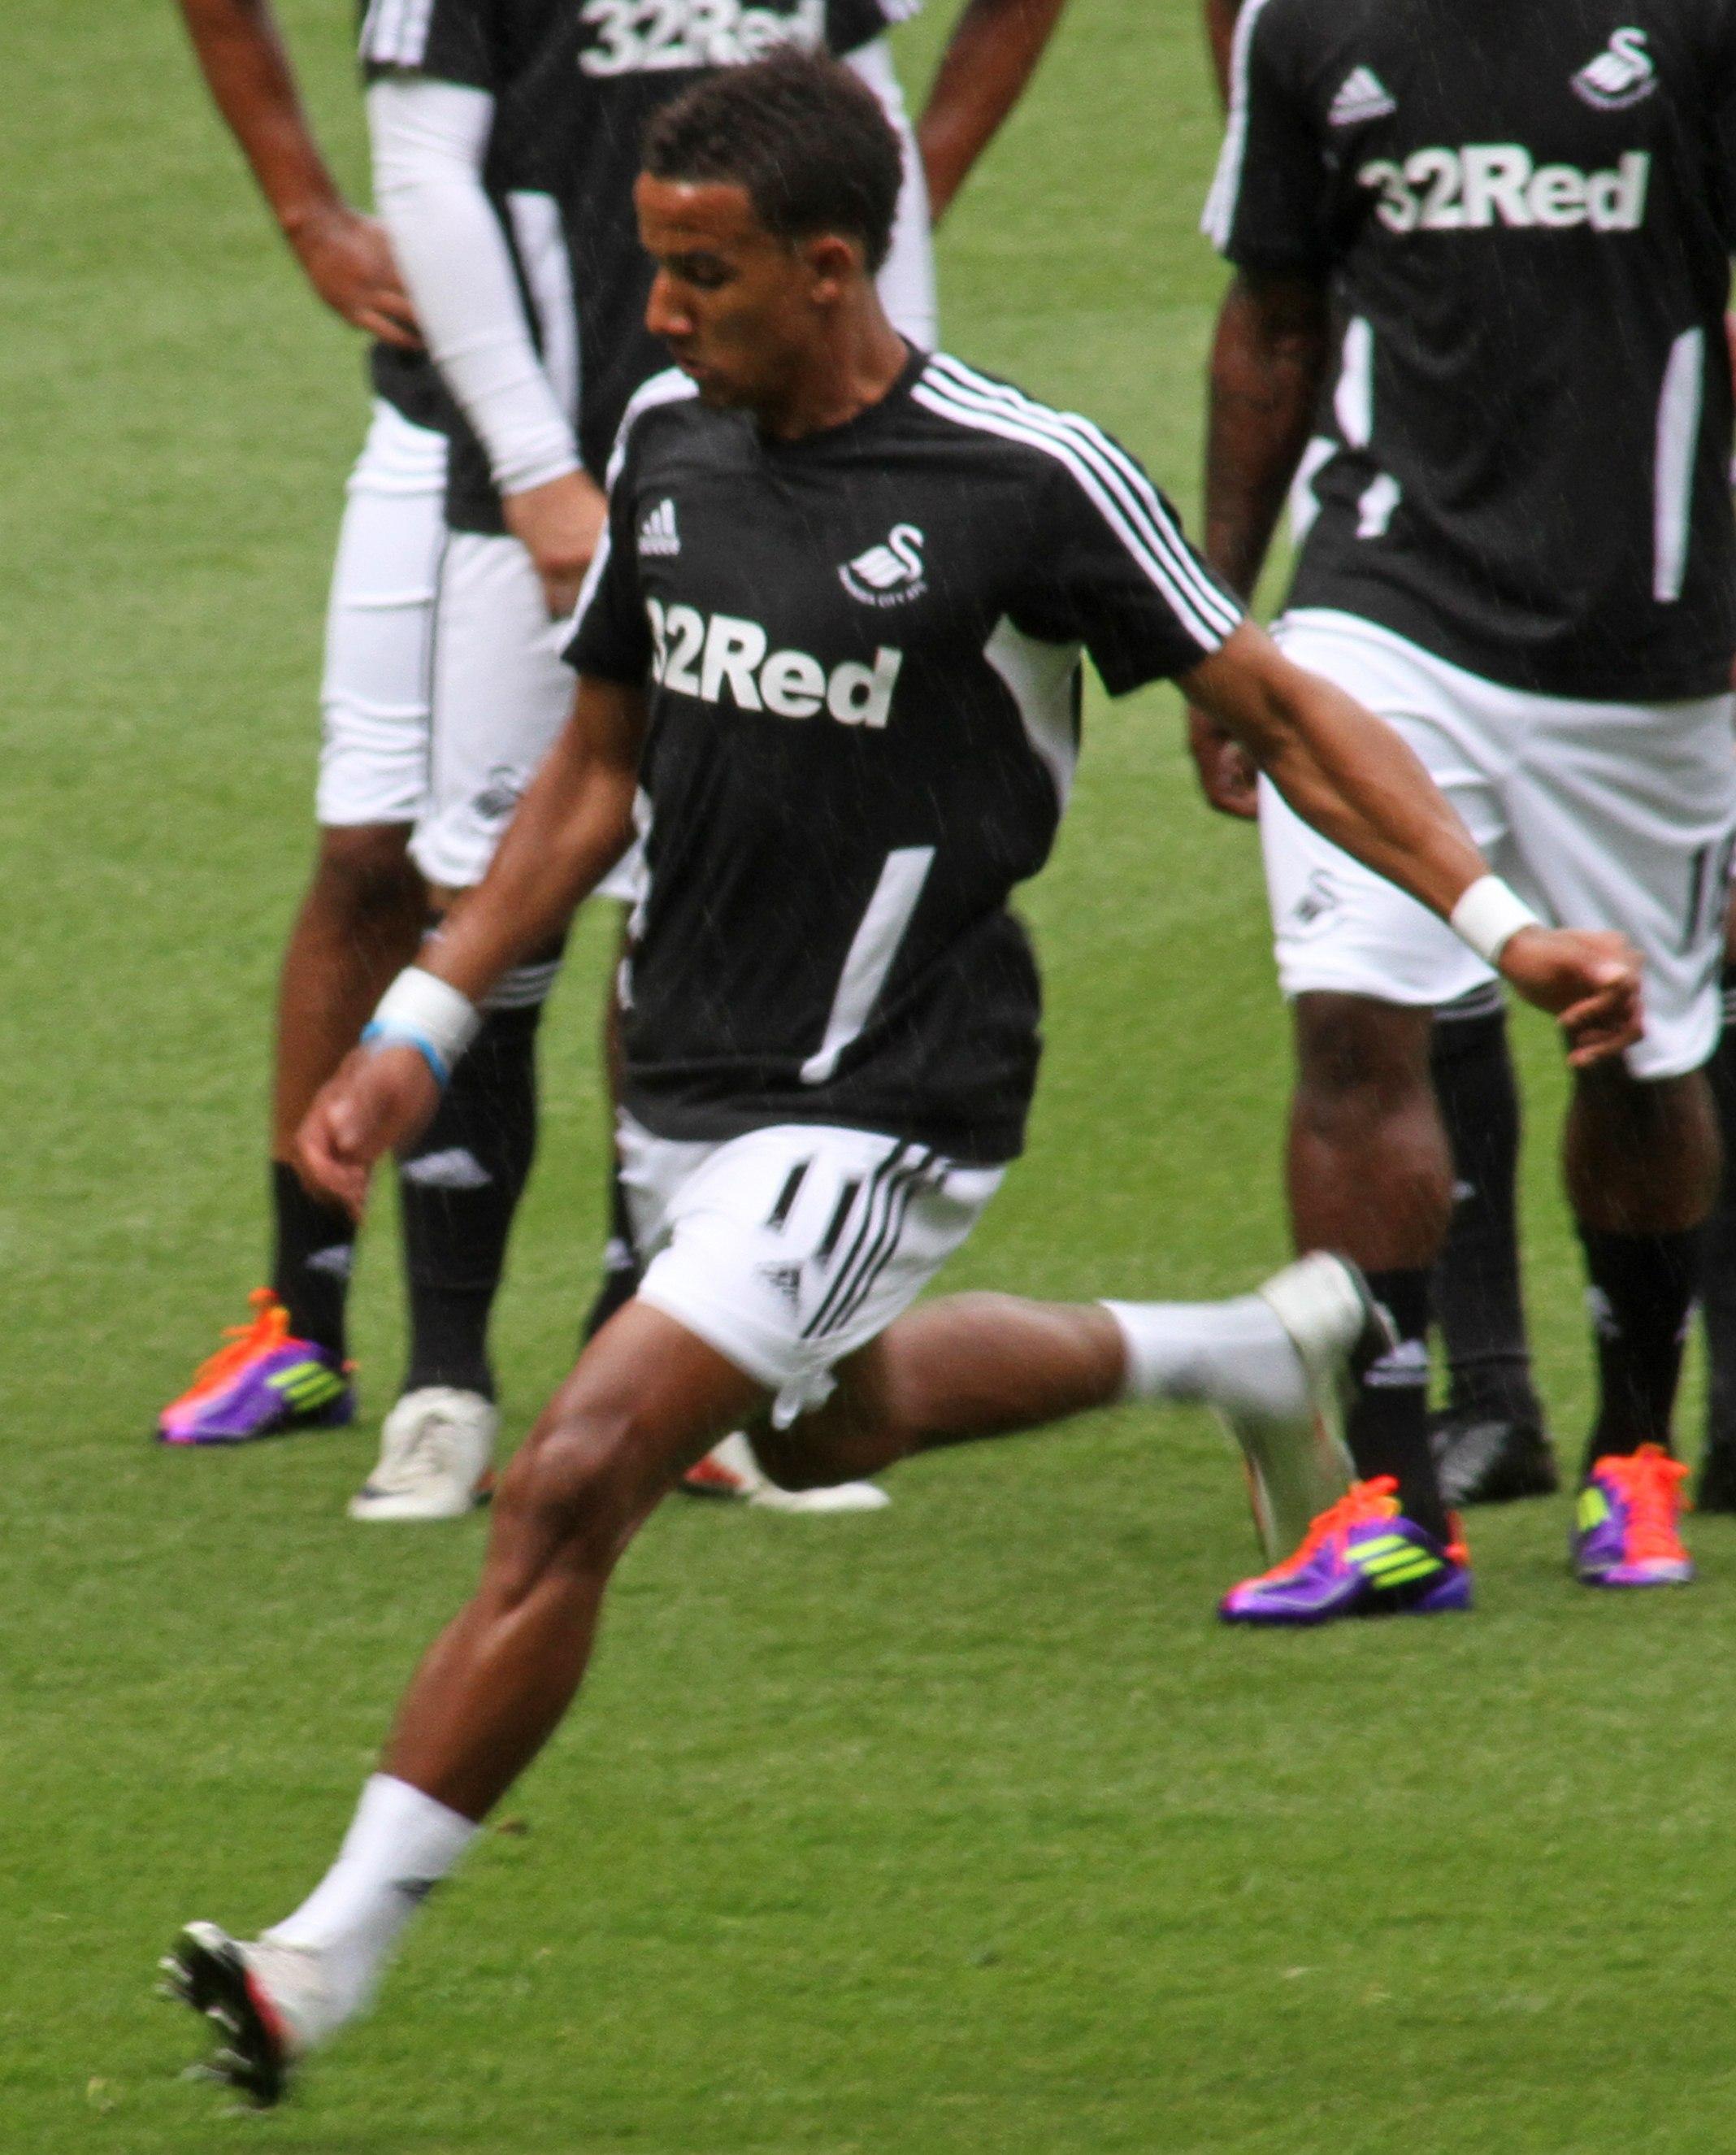 Scott_Sinclair_Swansea_City_warm_up_vs_Arsenal_2011_(cropped)